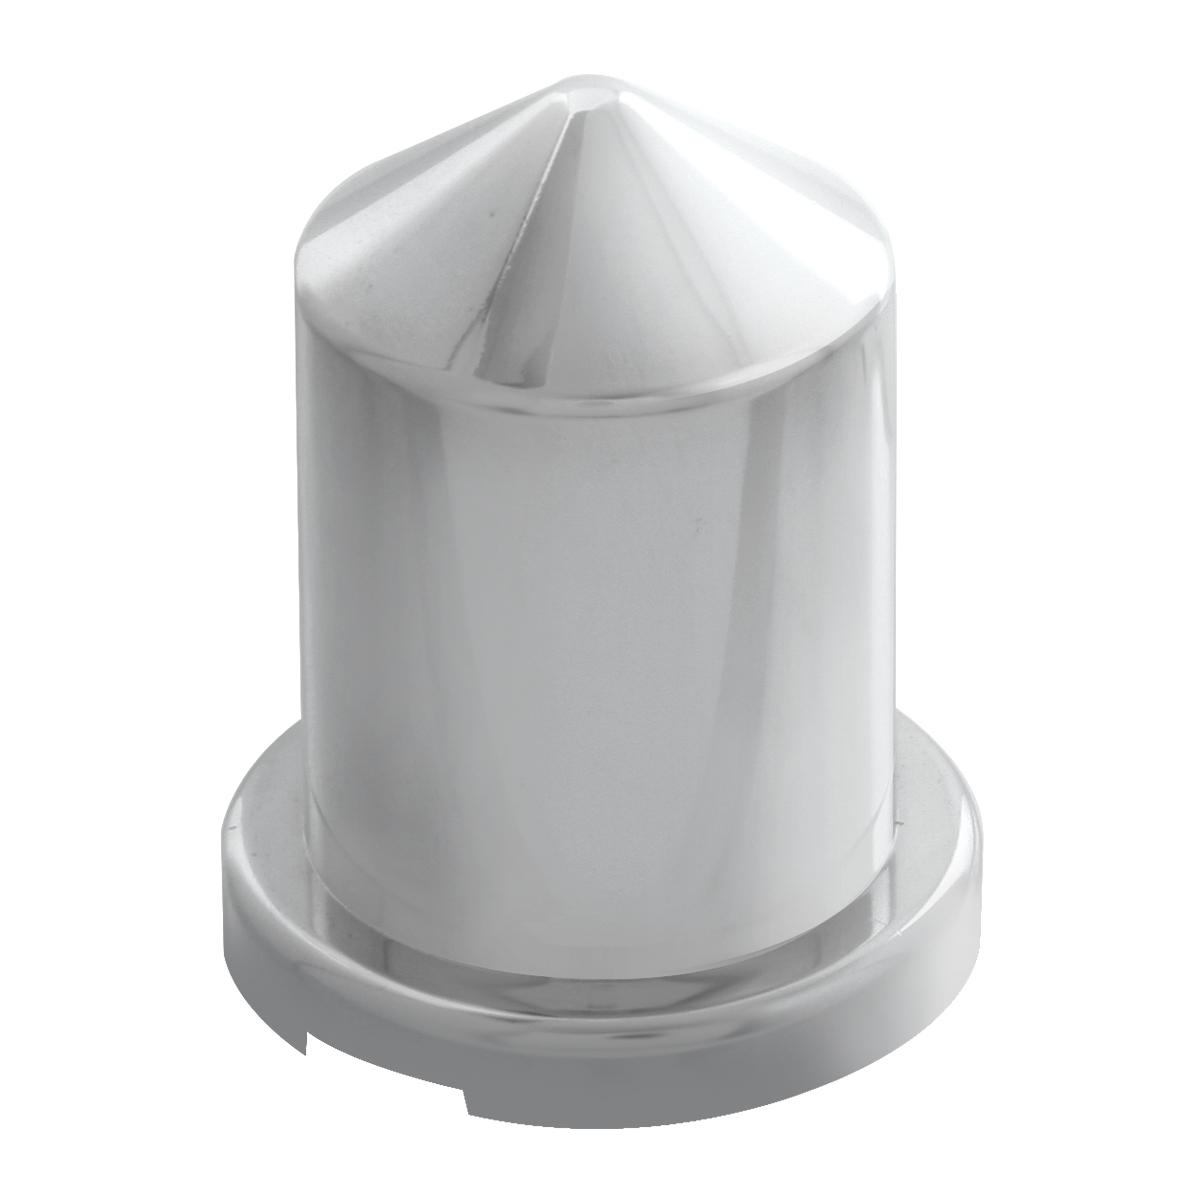 "Chrome Plastic ¹³∕₁₆"" Push-On Multi-Size Round Pointed Lug Nut Cover"